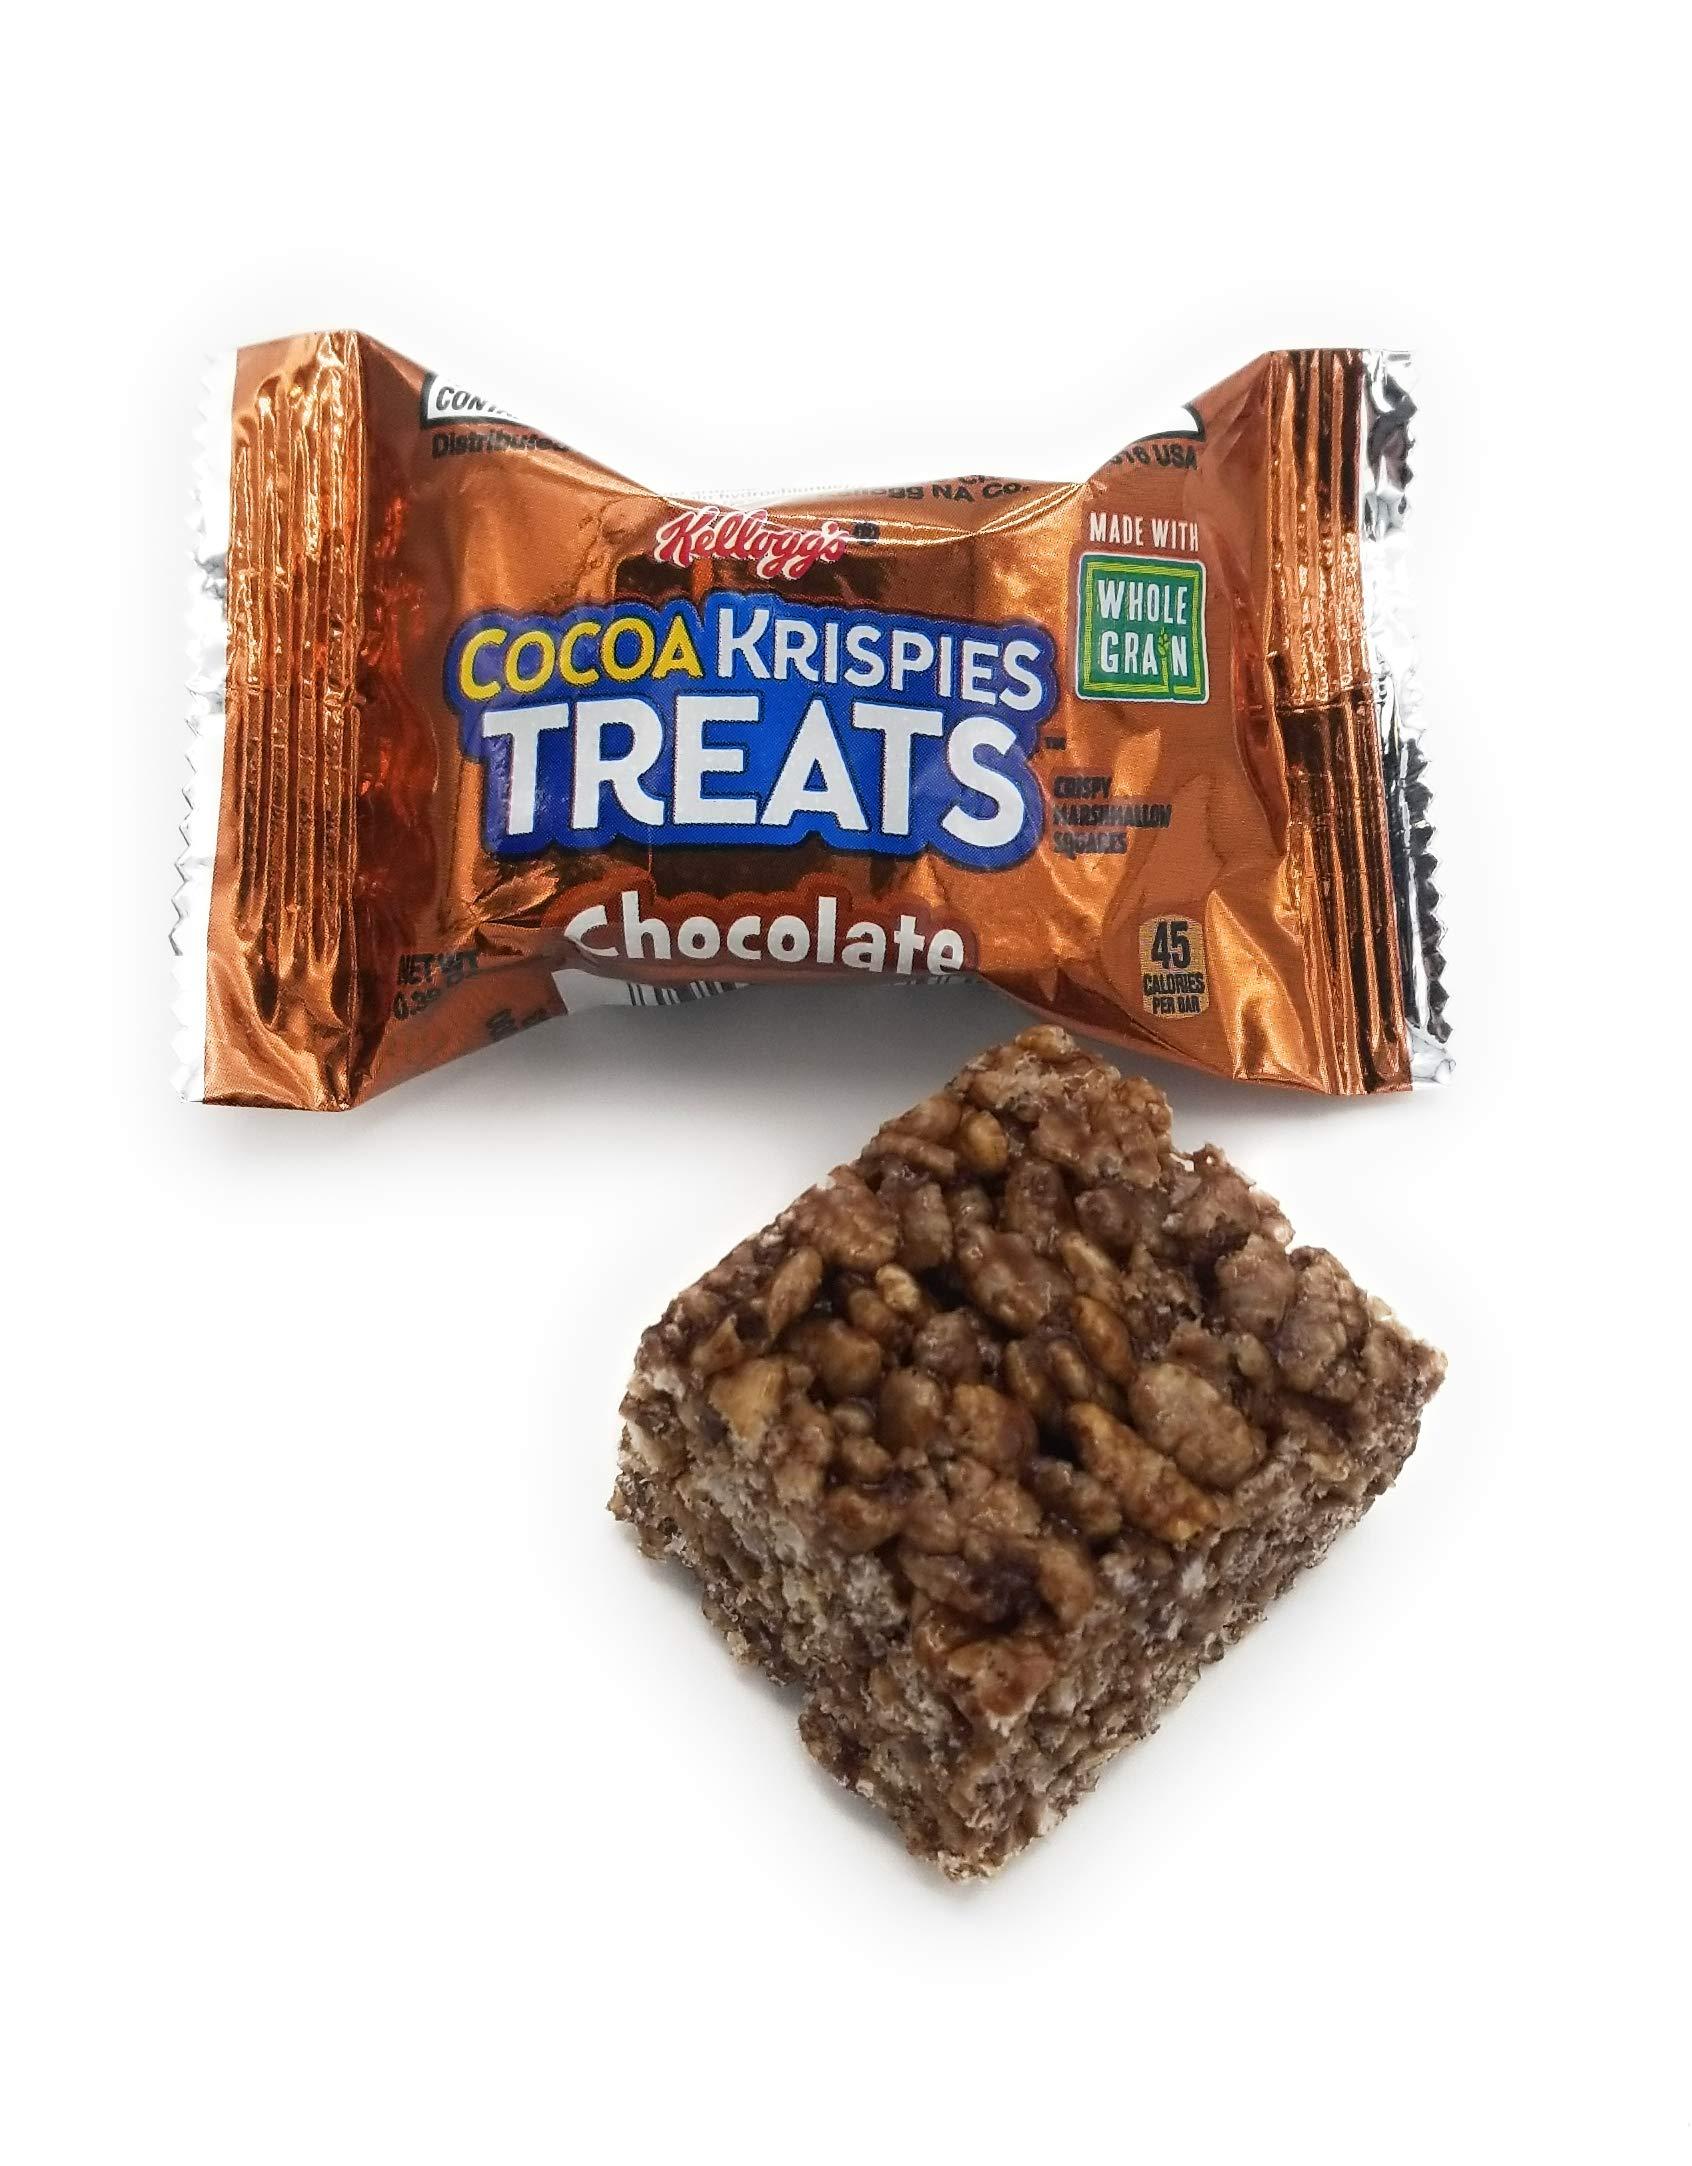 Kellogg's Cocoa Krispies Treats, Crispy Marshmallow Squares, Chocolate, (Pack of 100, 0.39 oz Bars)